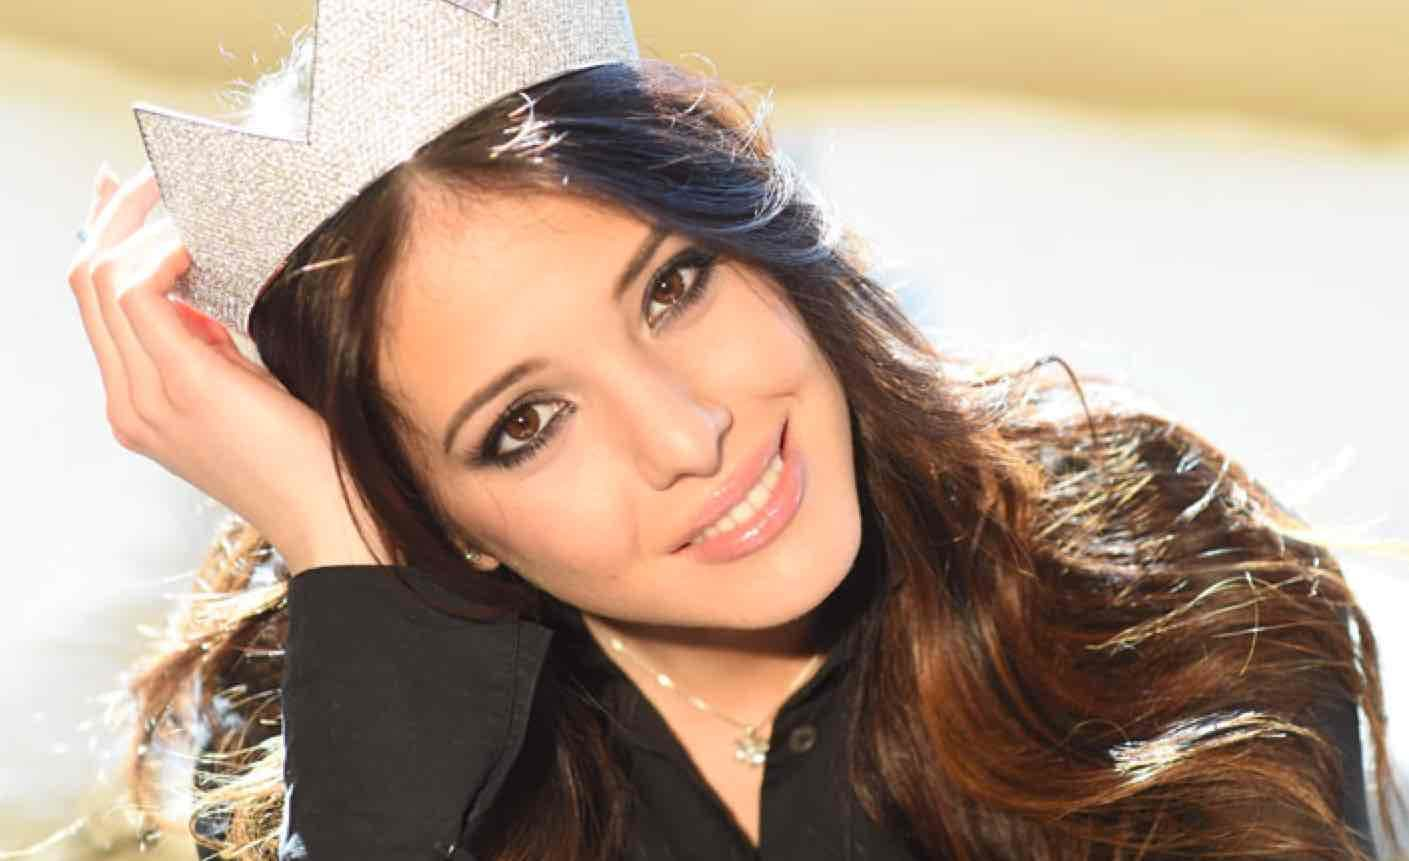 Miss Italia - Clarissa Marchese